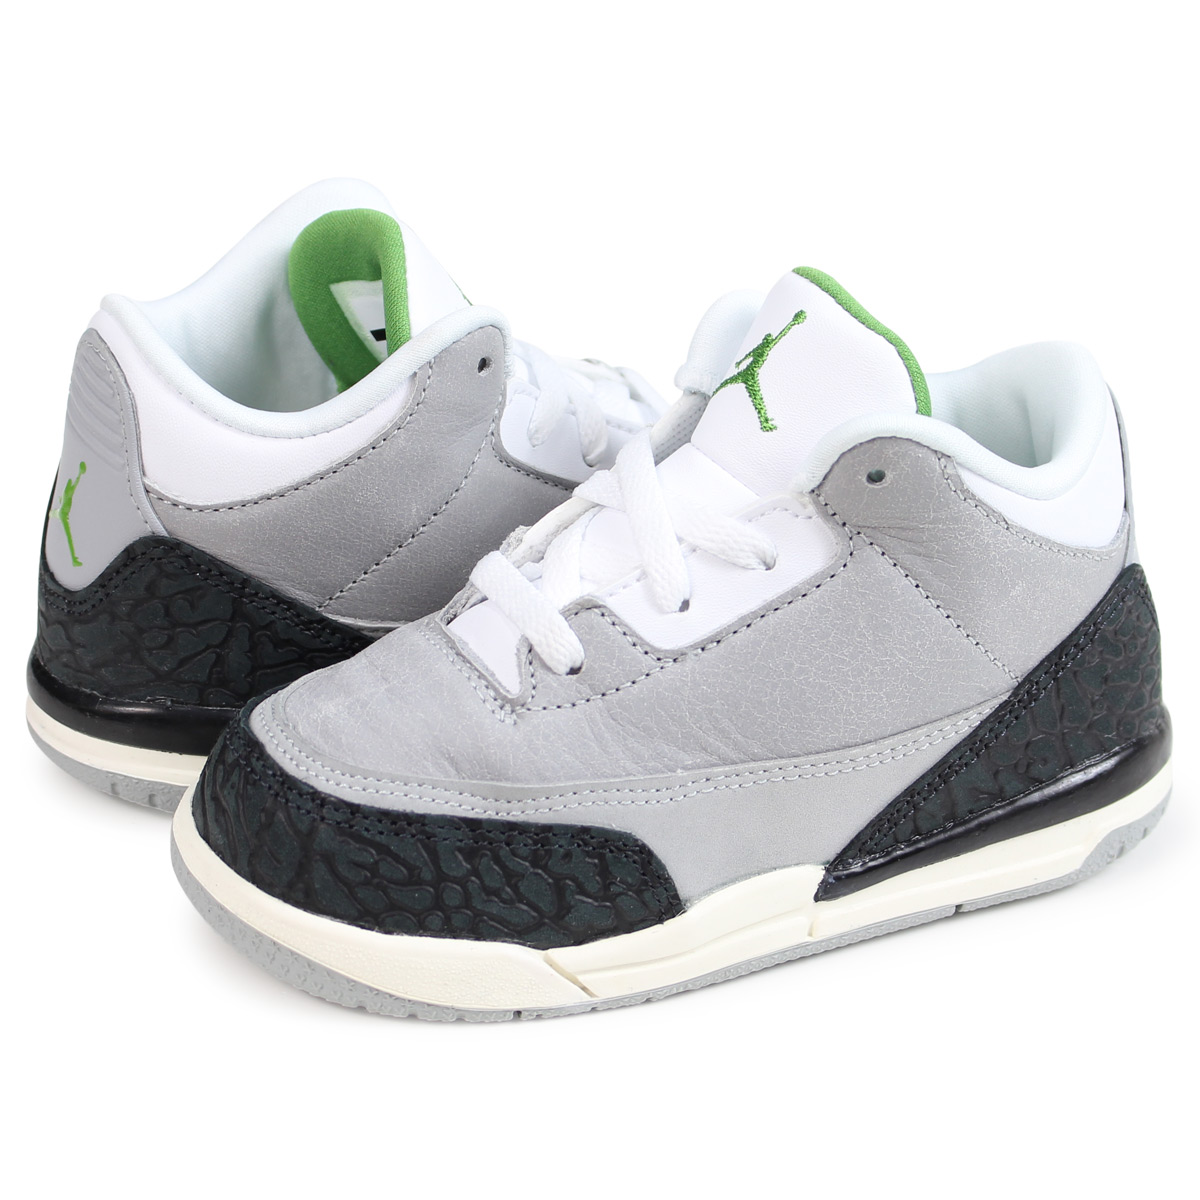 39544aeedc8a ... nike nike air jordan 3 nostalgic baby sneakers air jordan 3 retro td  gray 832 033 ...